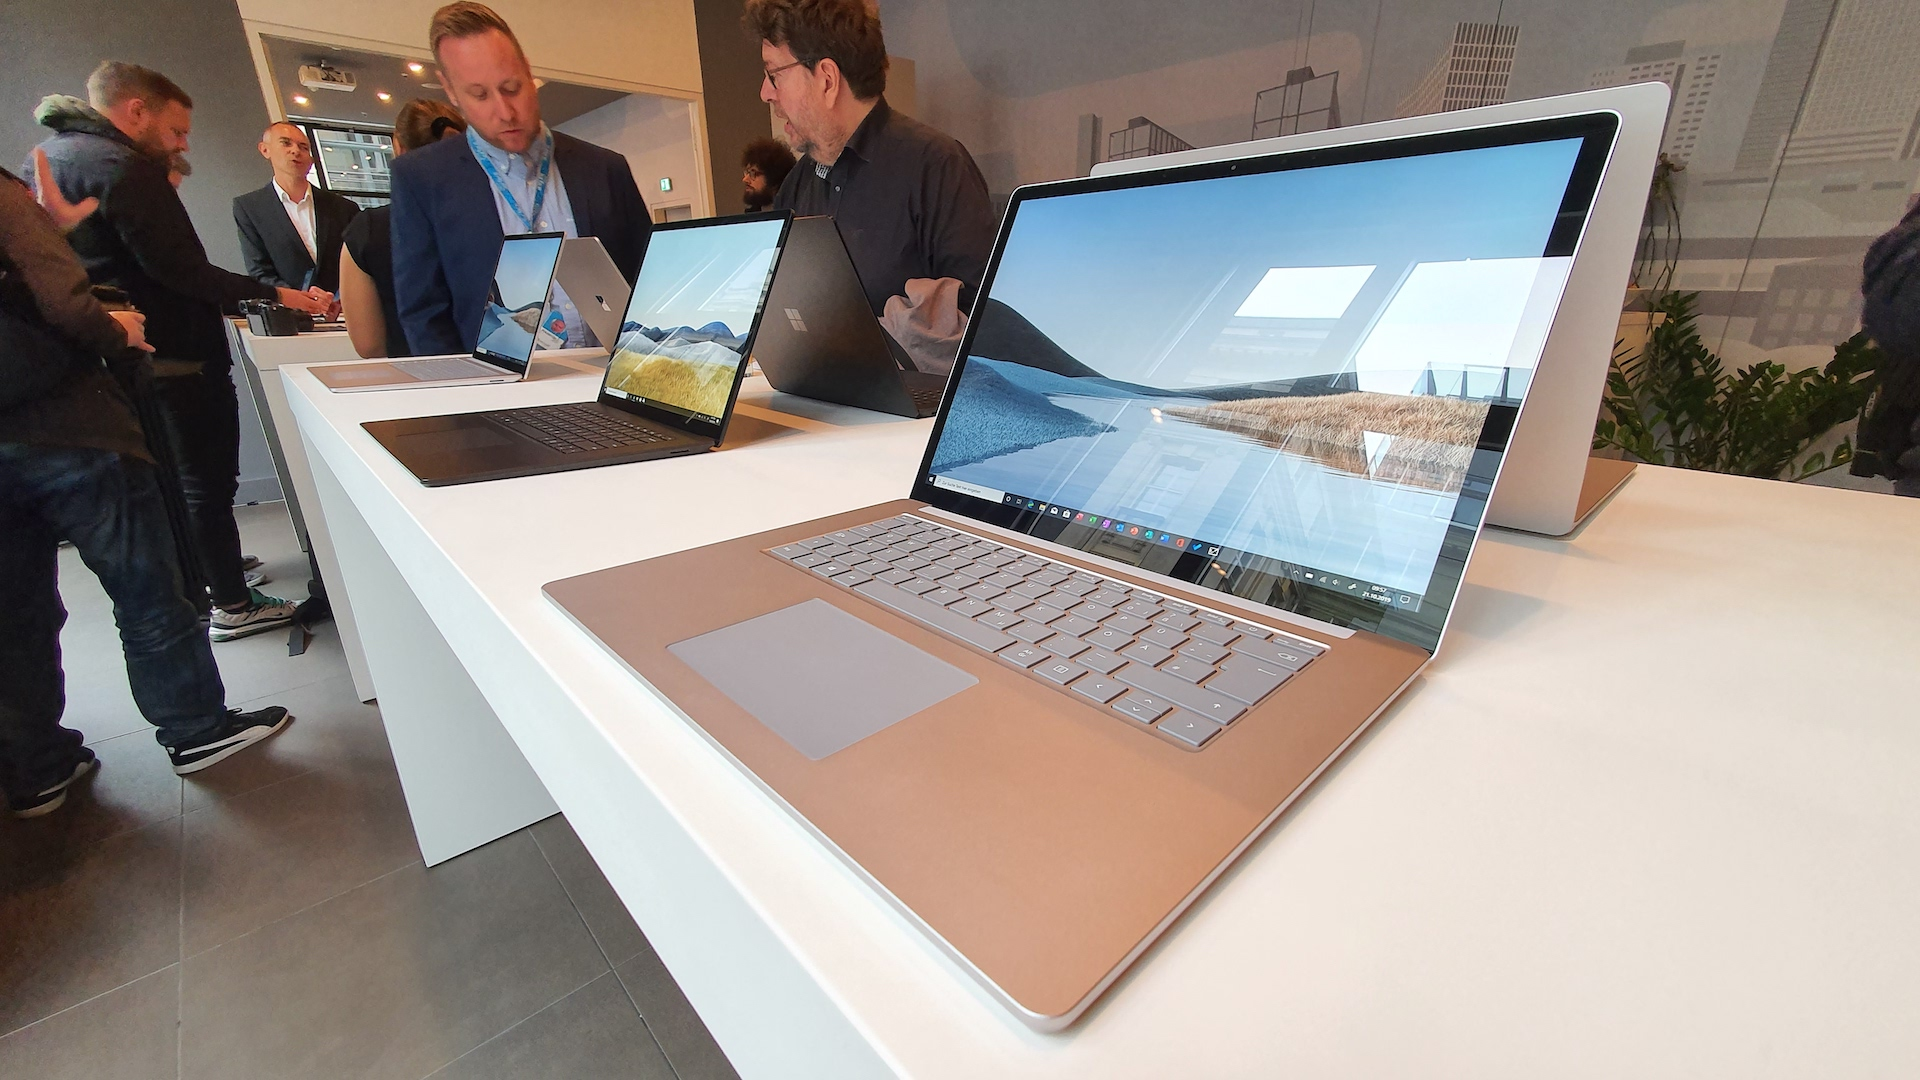 SurfaceLaptop3_uden_alcantara